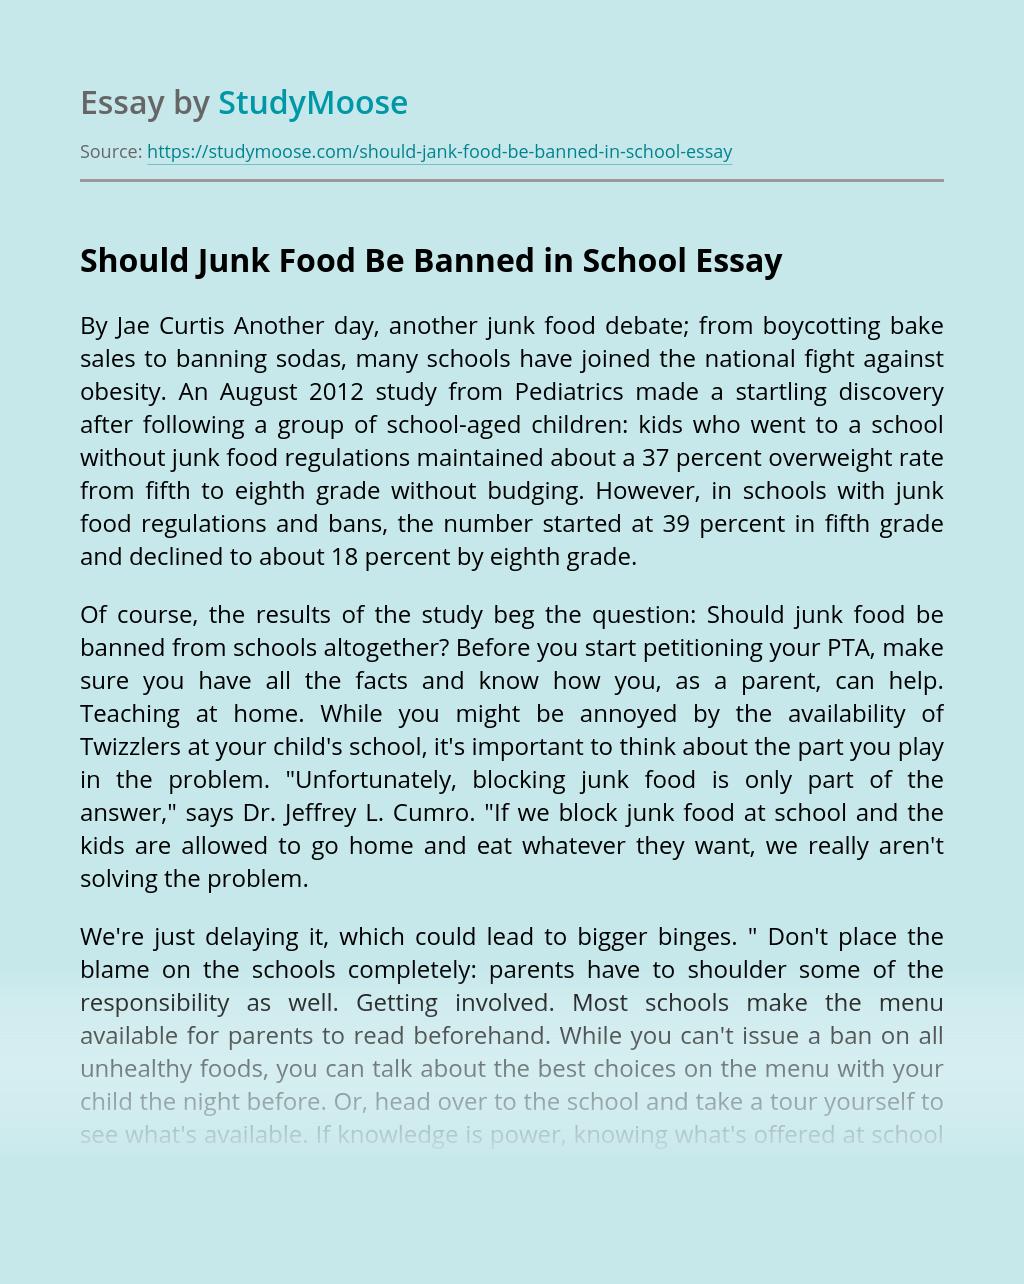 Should Junk Food Be Banned in School